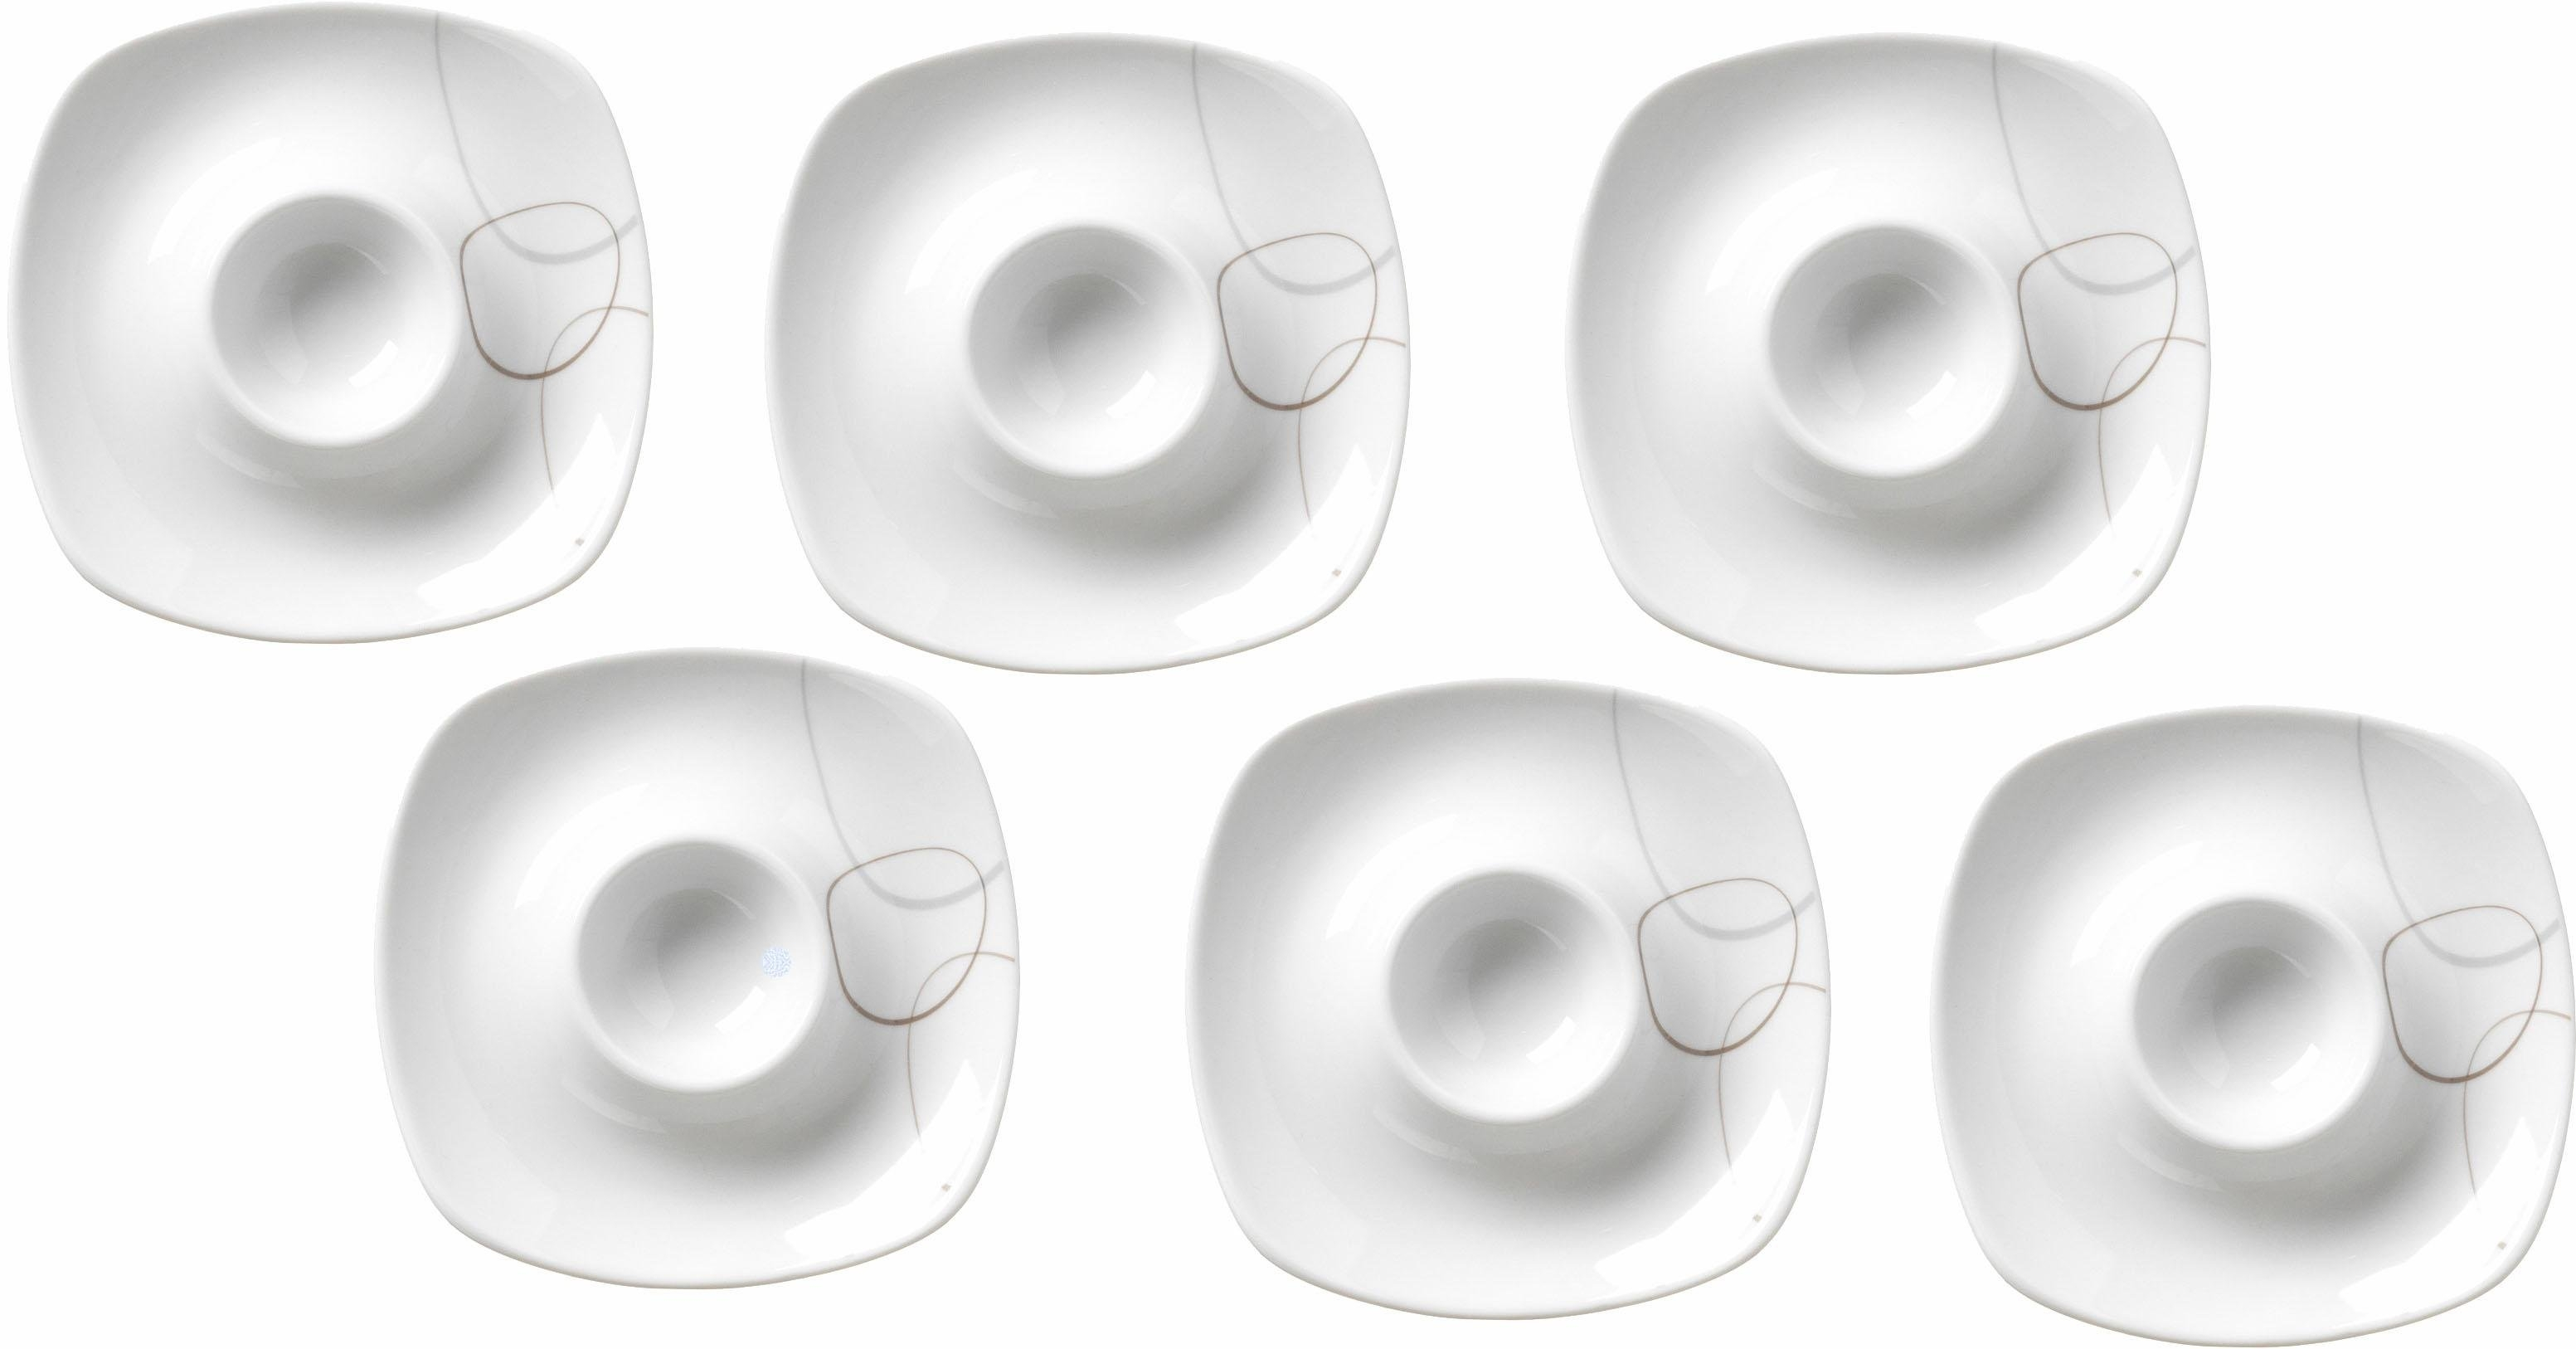 Ritzenhoff & Breker eierdopje Alina (set, 6-delig) - verschillende betaalmethodes